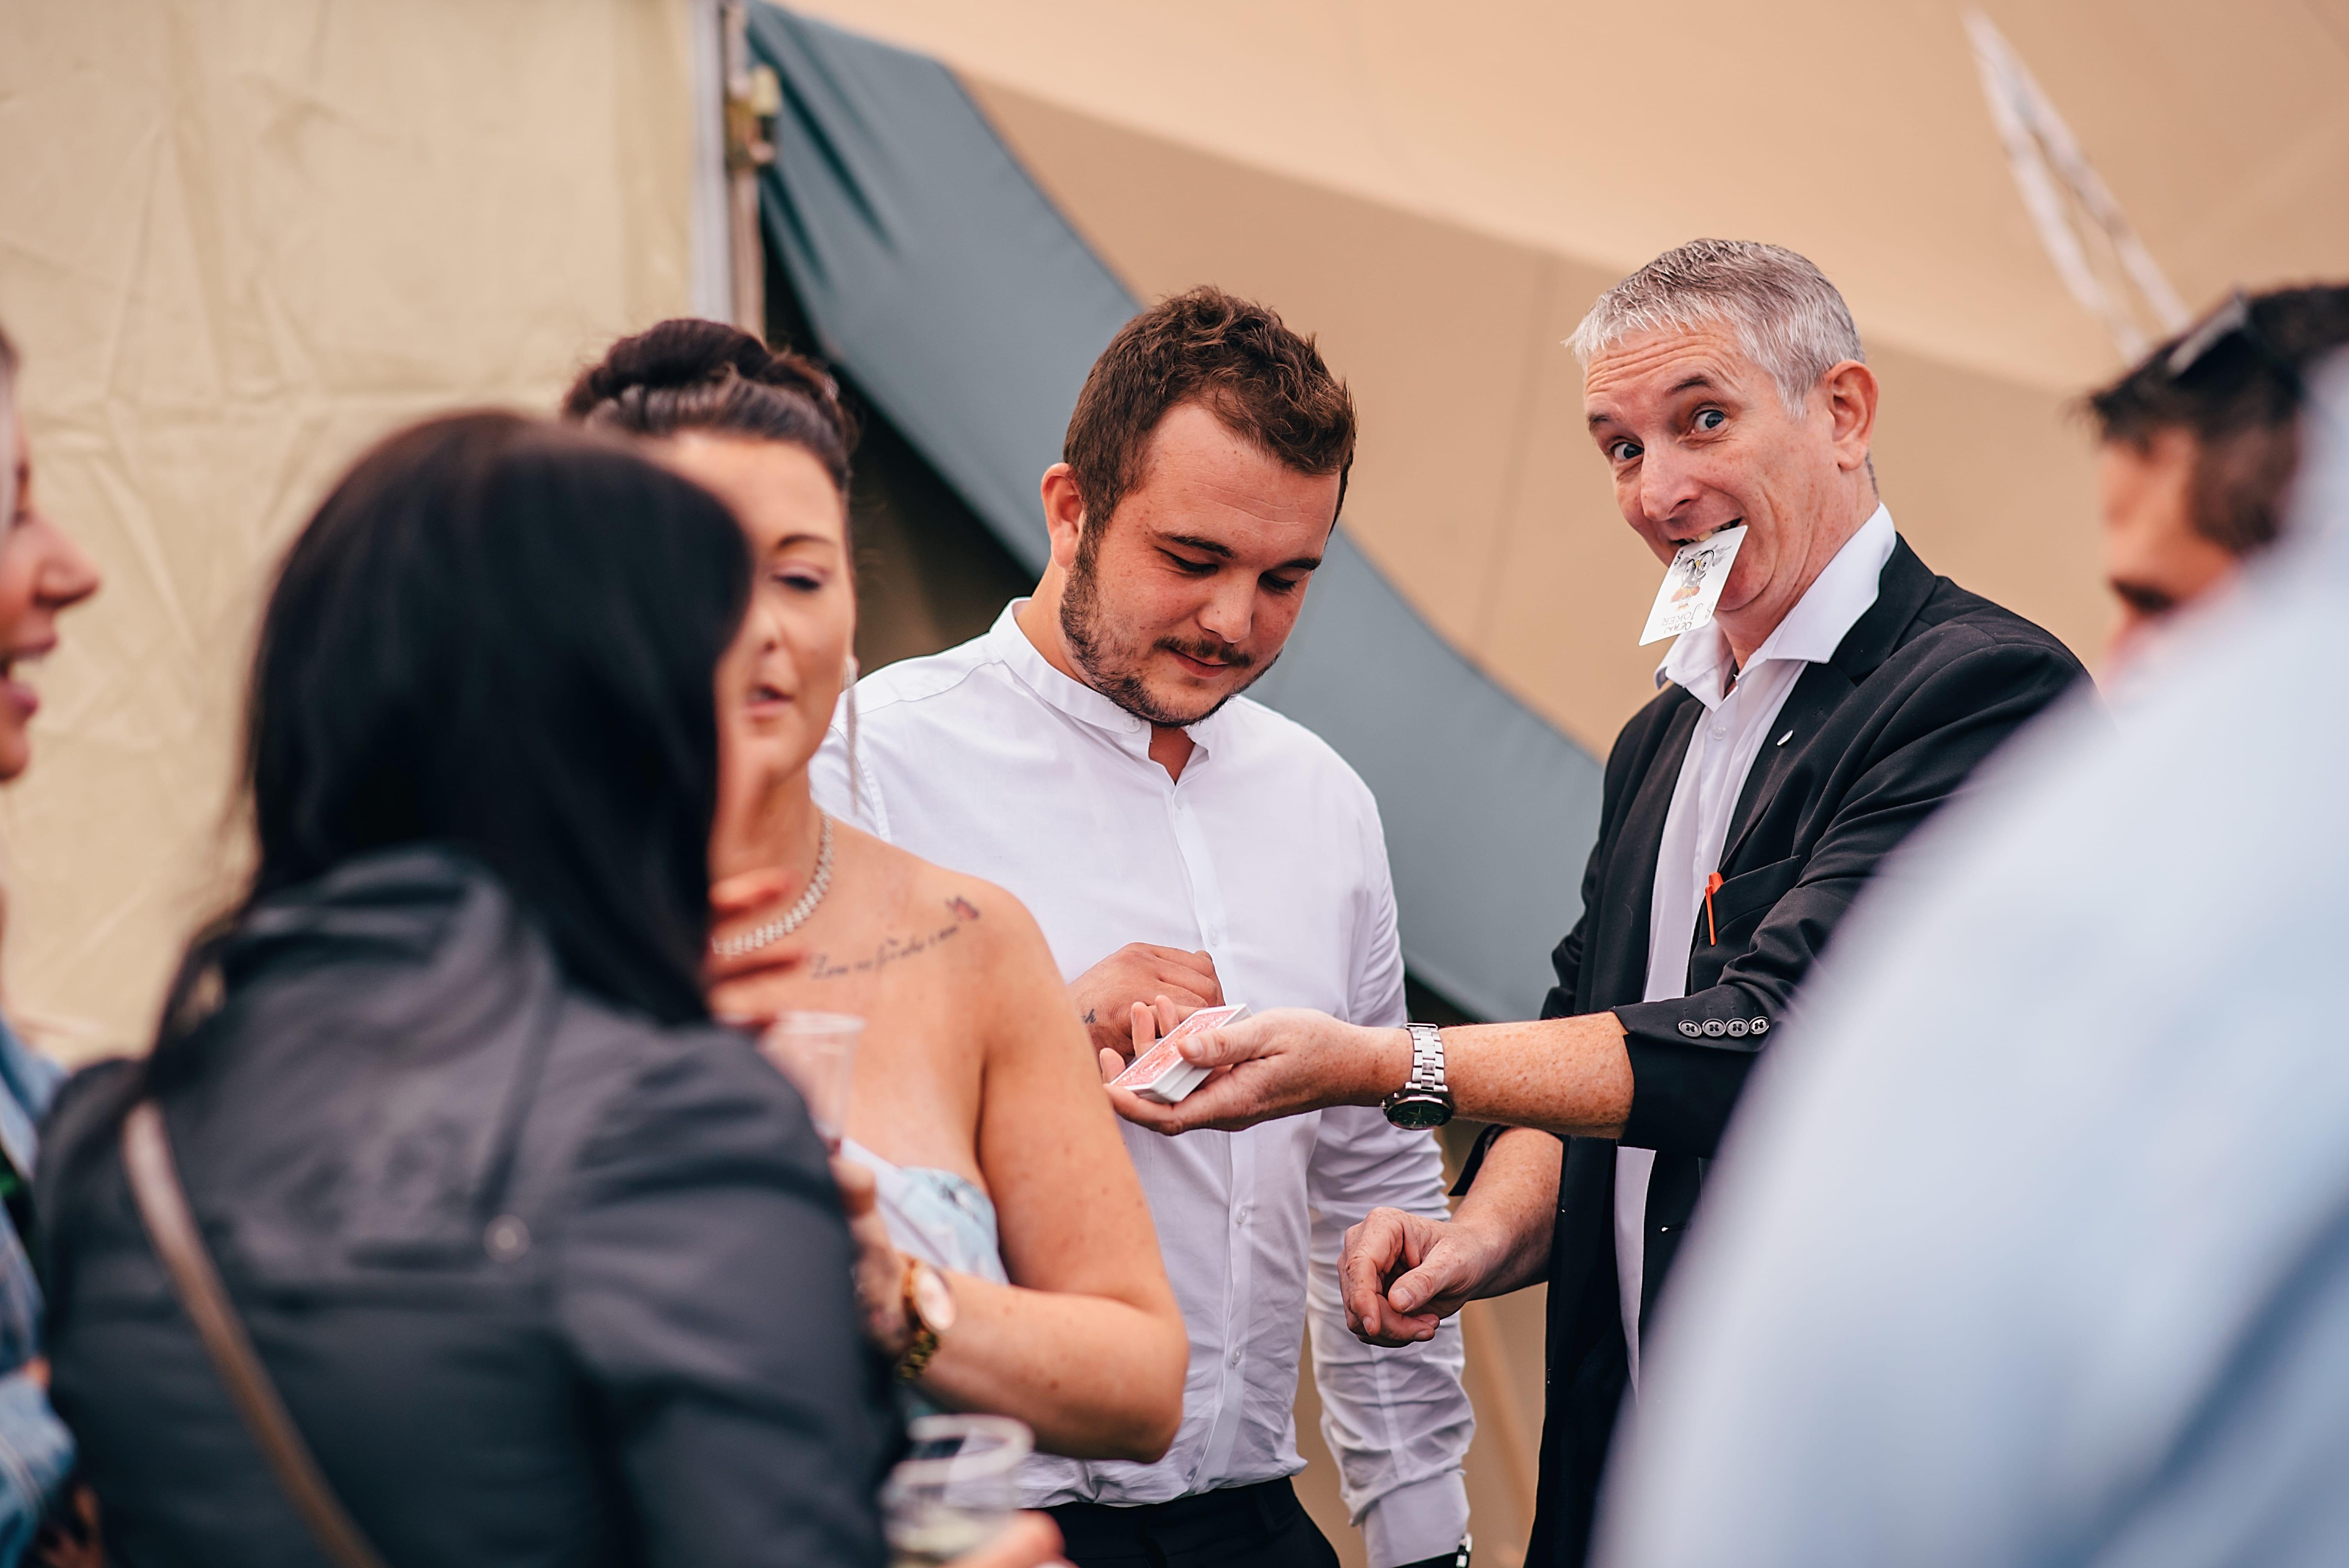 Magician, New Hall Magician, The Belfry Magician, Staffordshire Wedding Magician, Warwickshire Wedding Magician, Worcestershire Wedding Magician, Owen Strickland Magic, Wedding Magic, Birmingham Corporate Magician